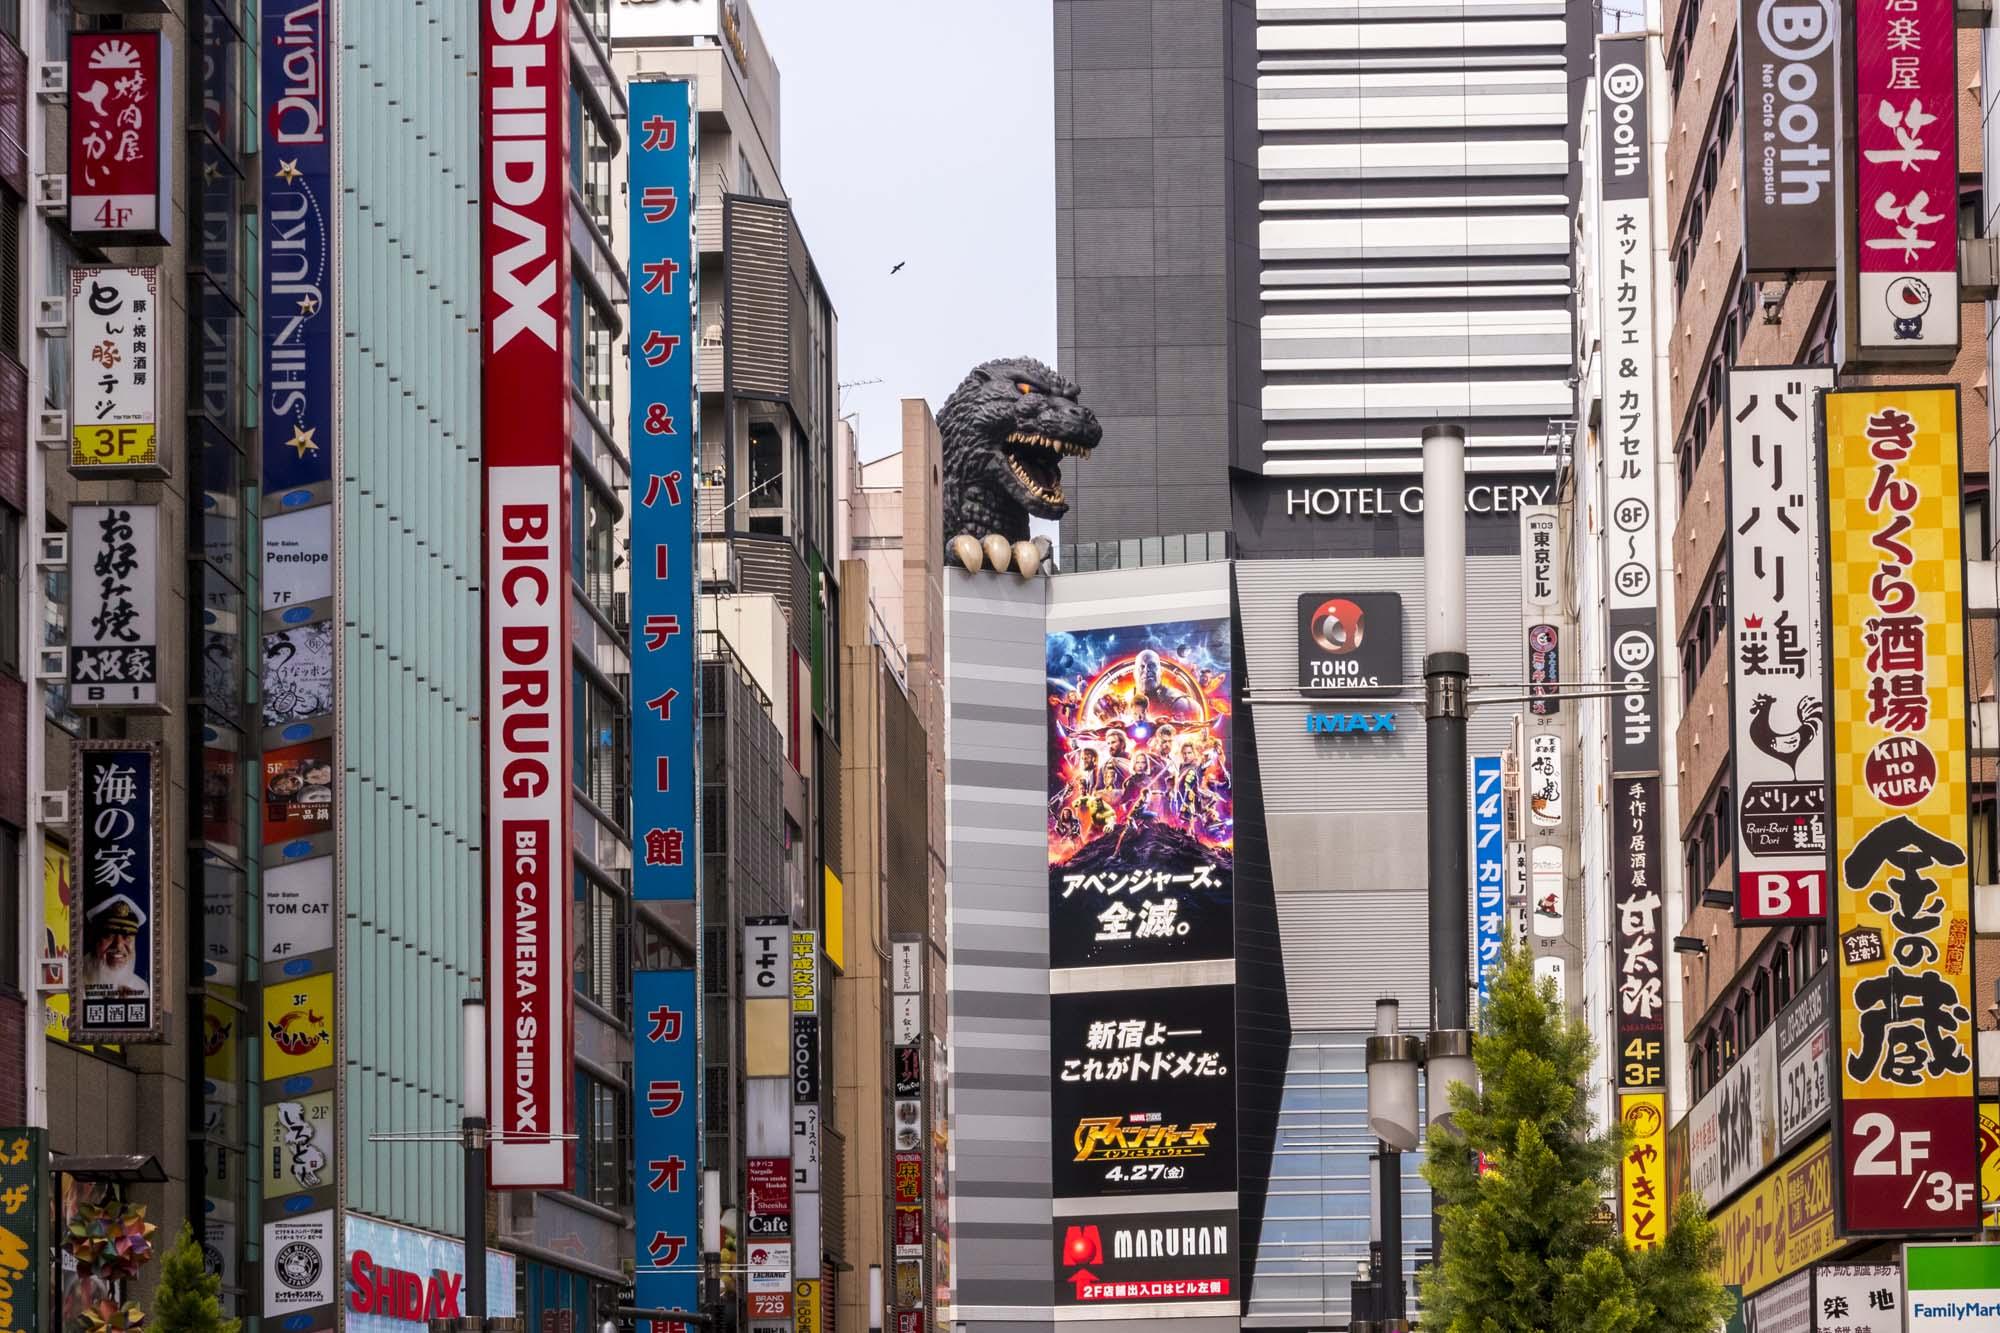 Shinjuku dans la ville de Tōkyō au Japon